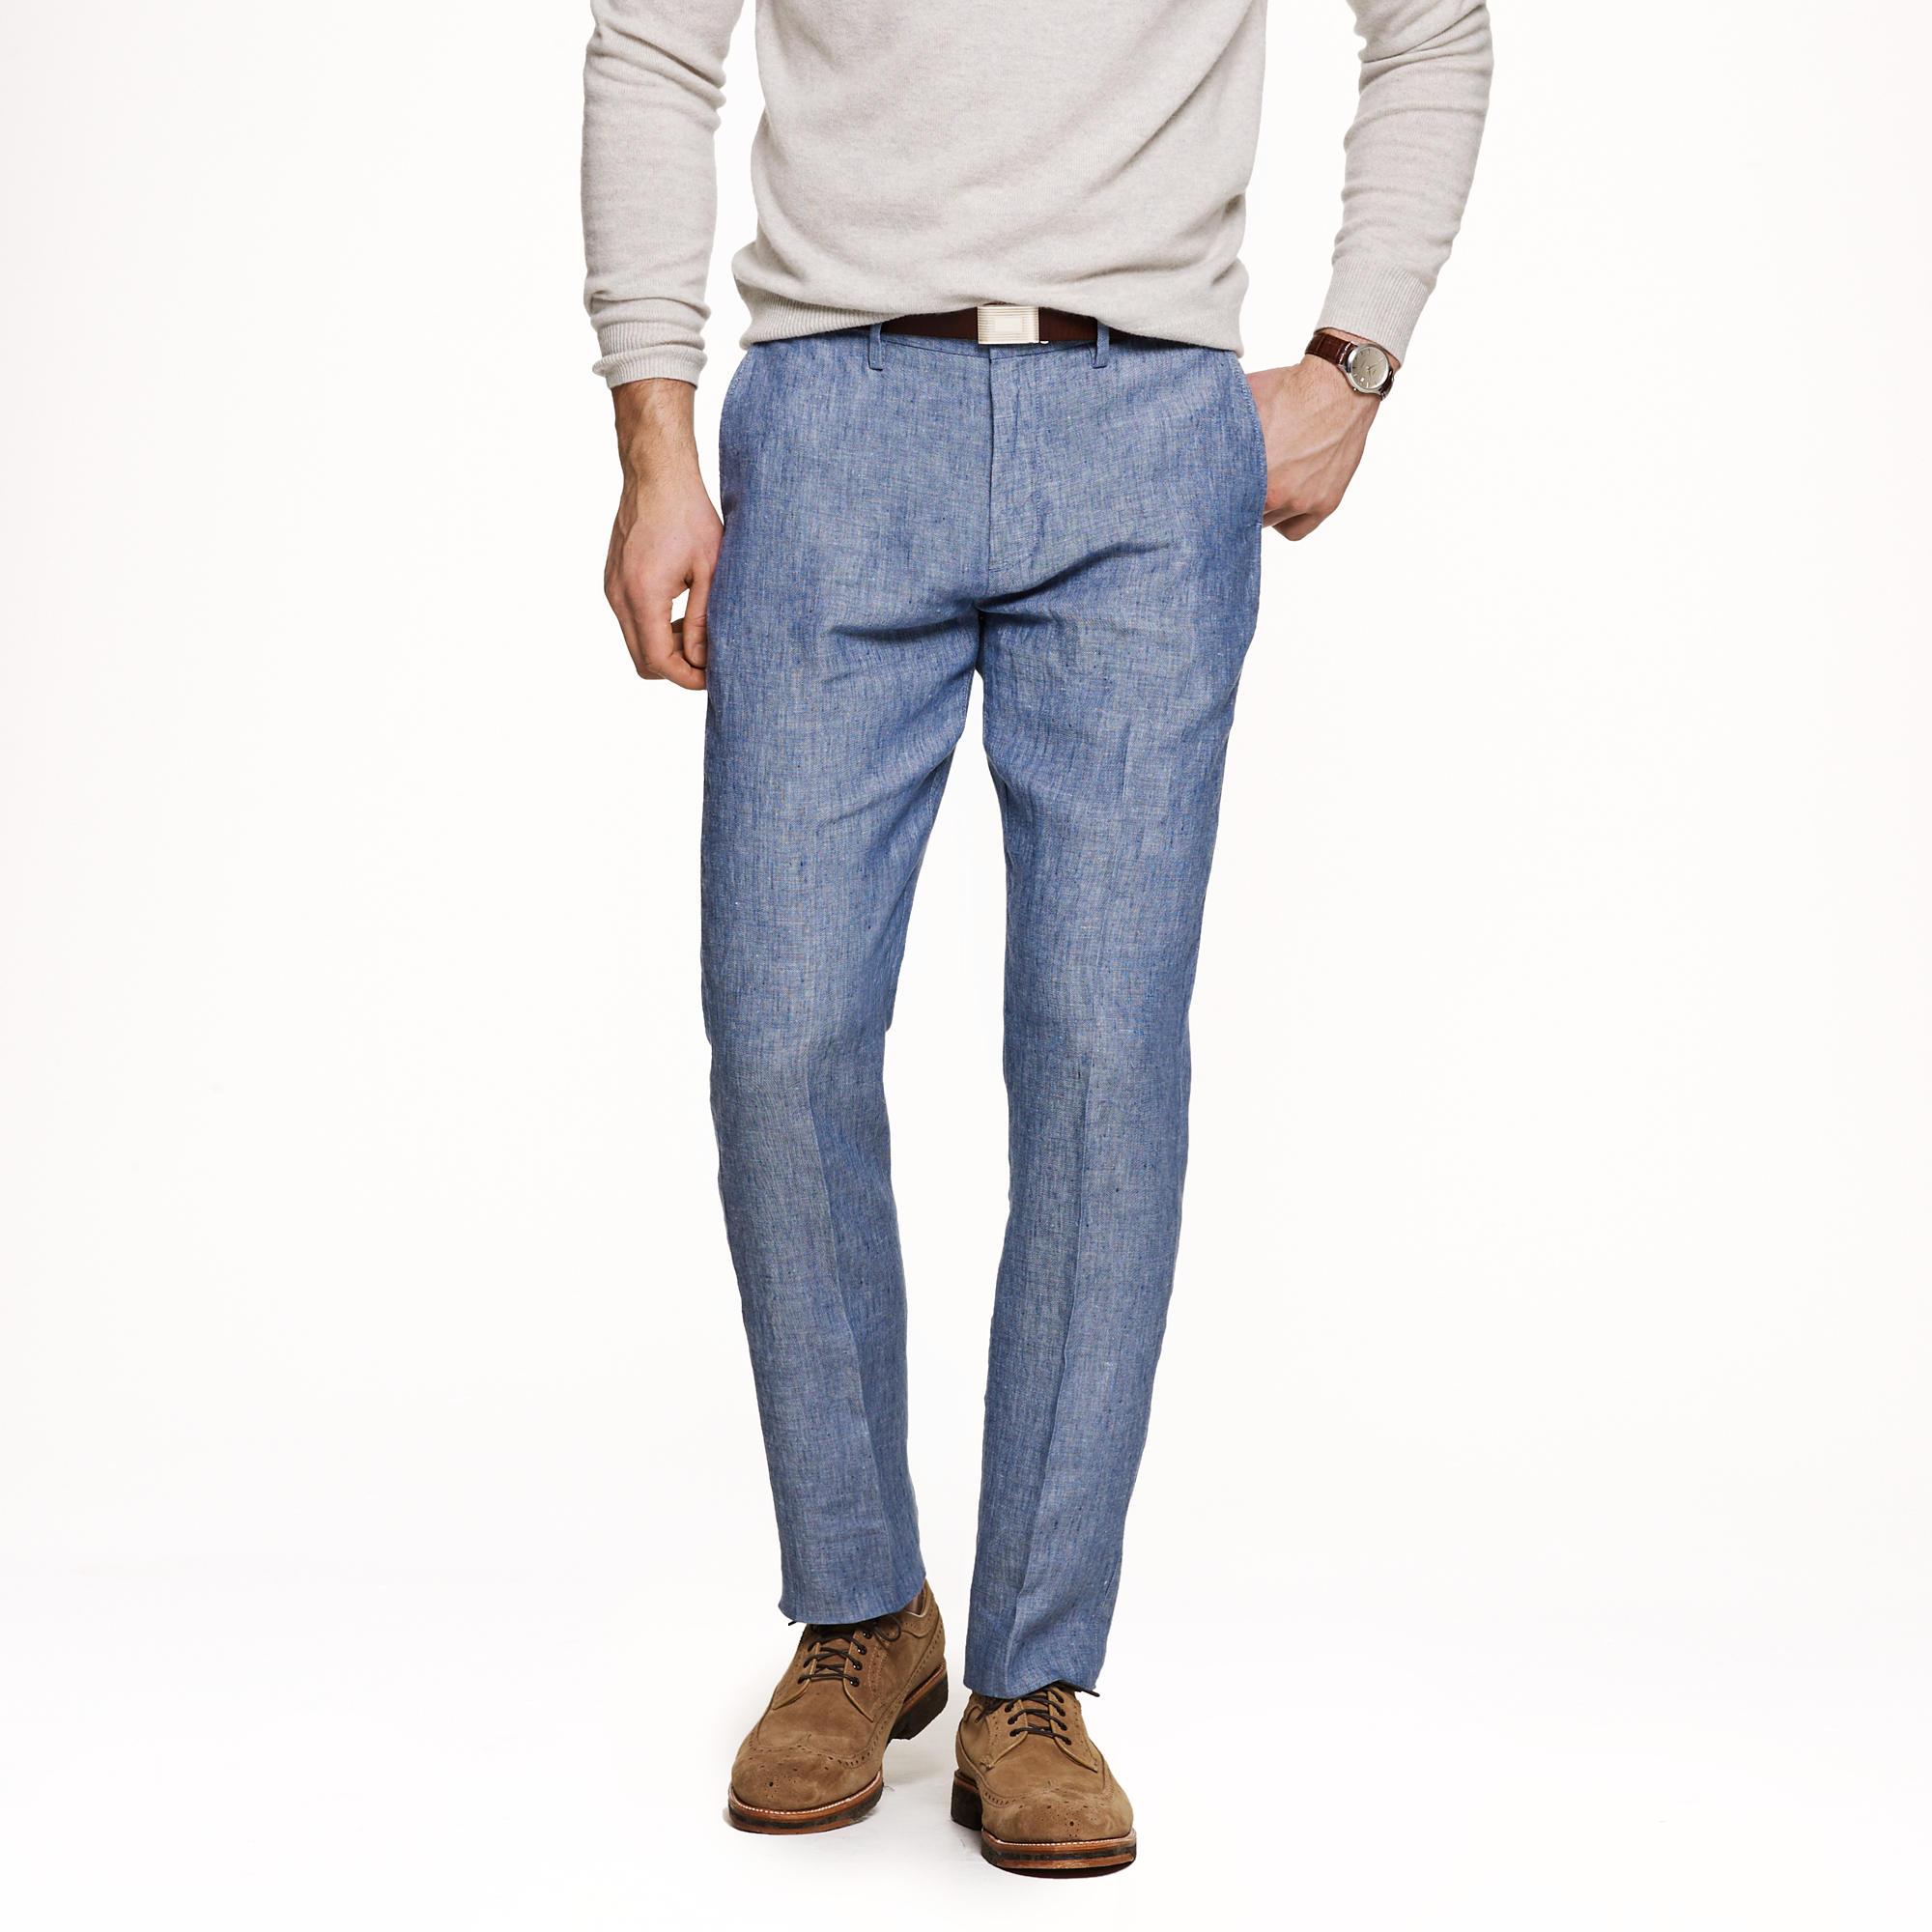 mens slim linen pants - Pi Pants